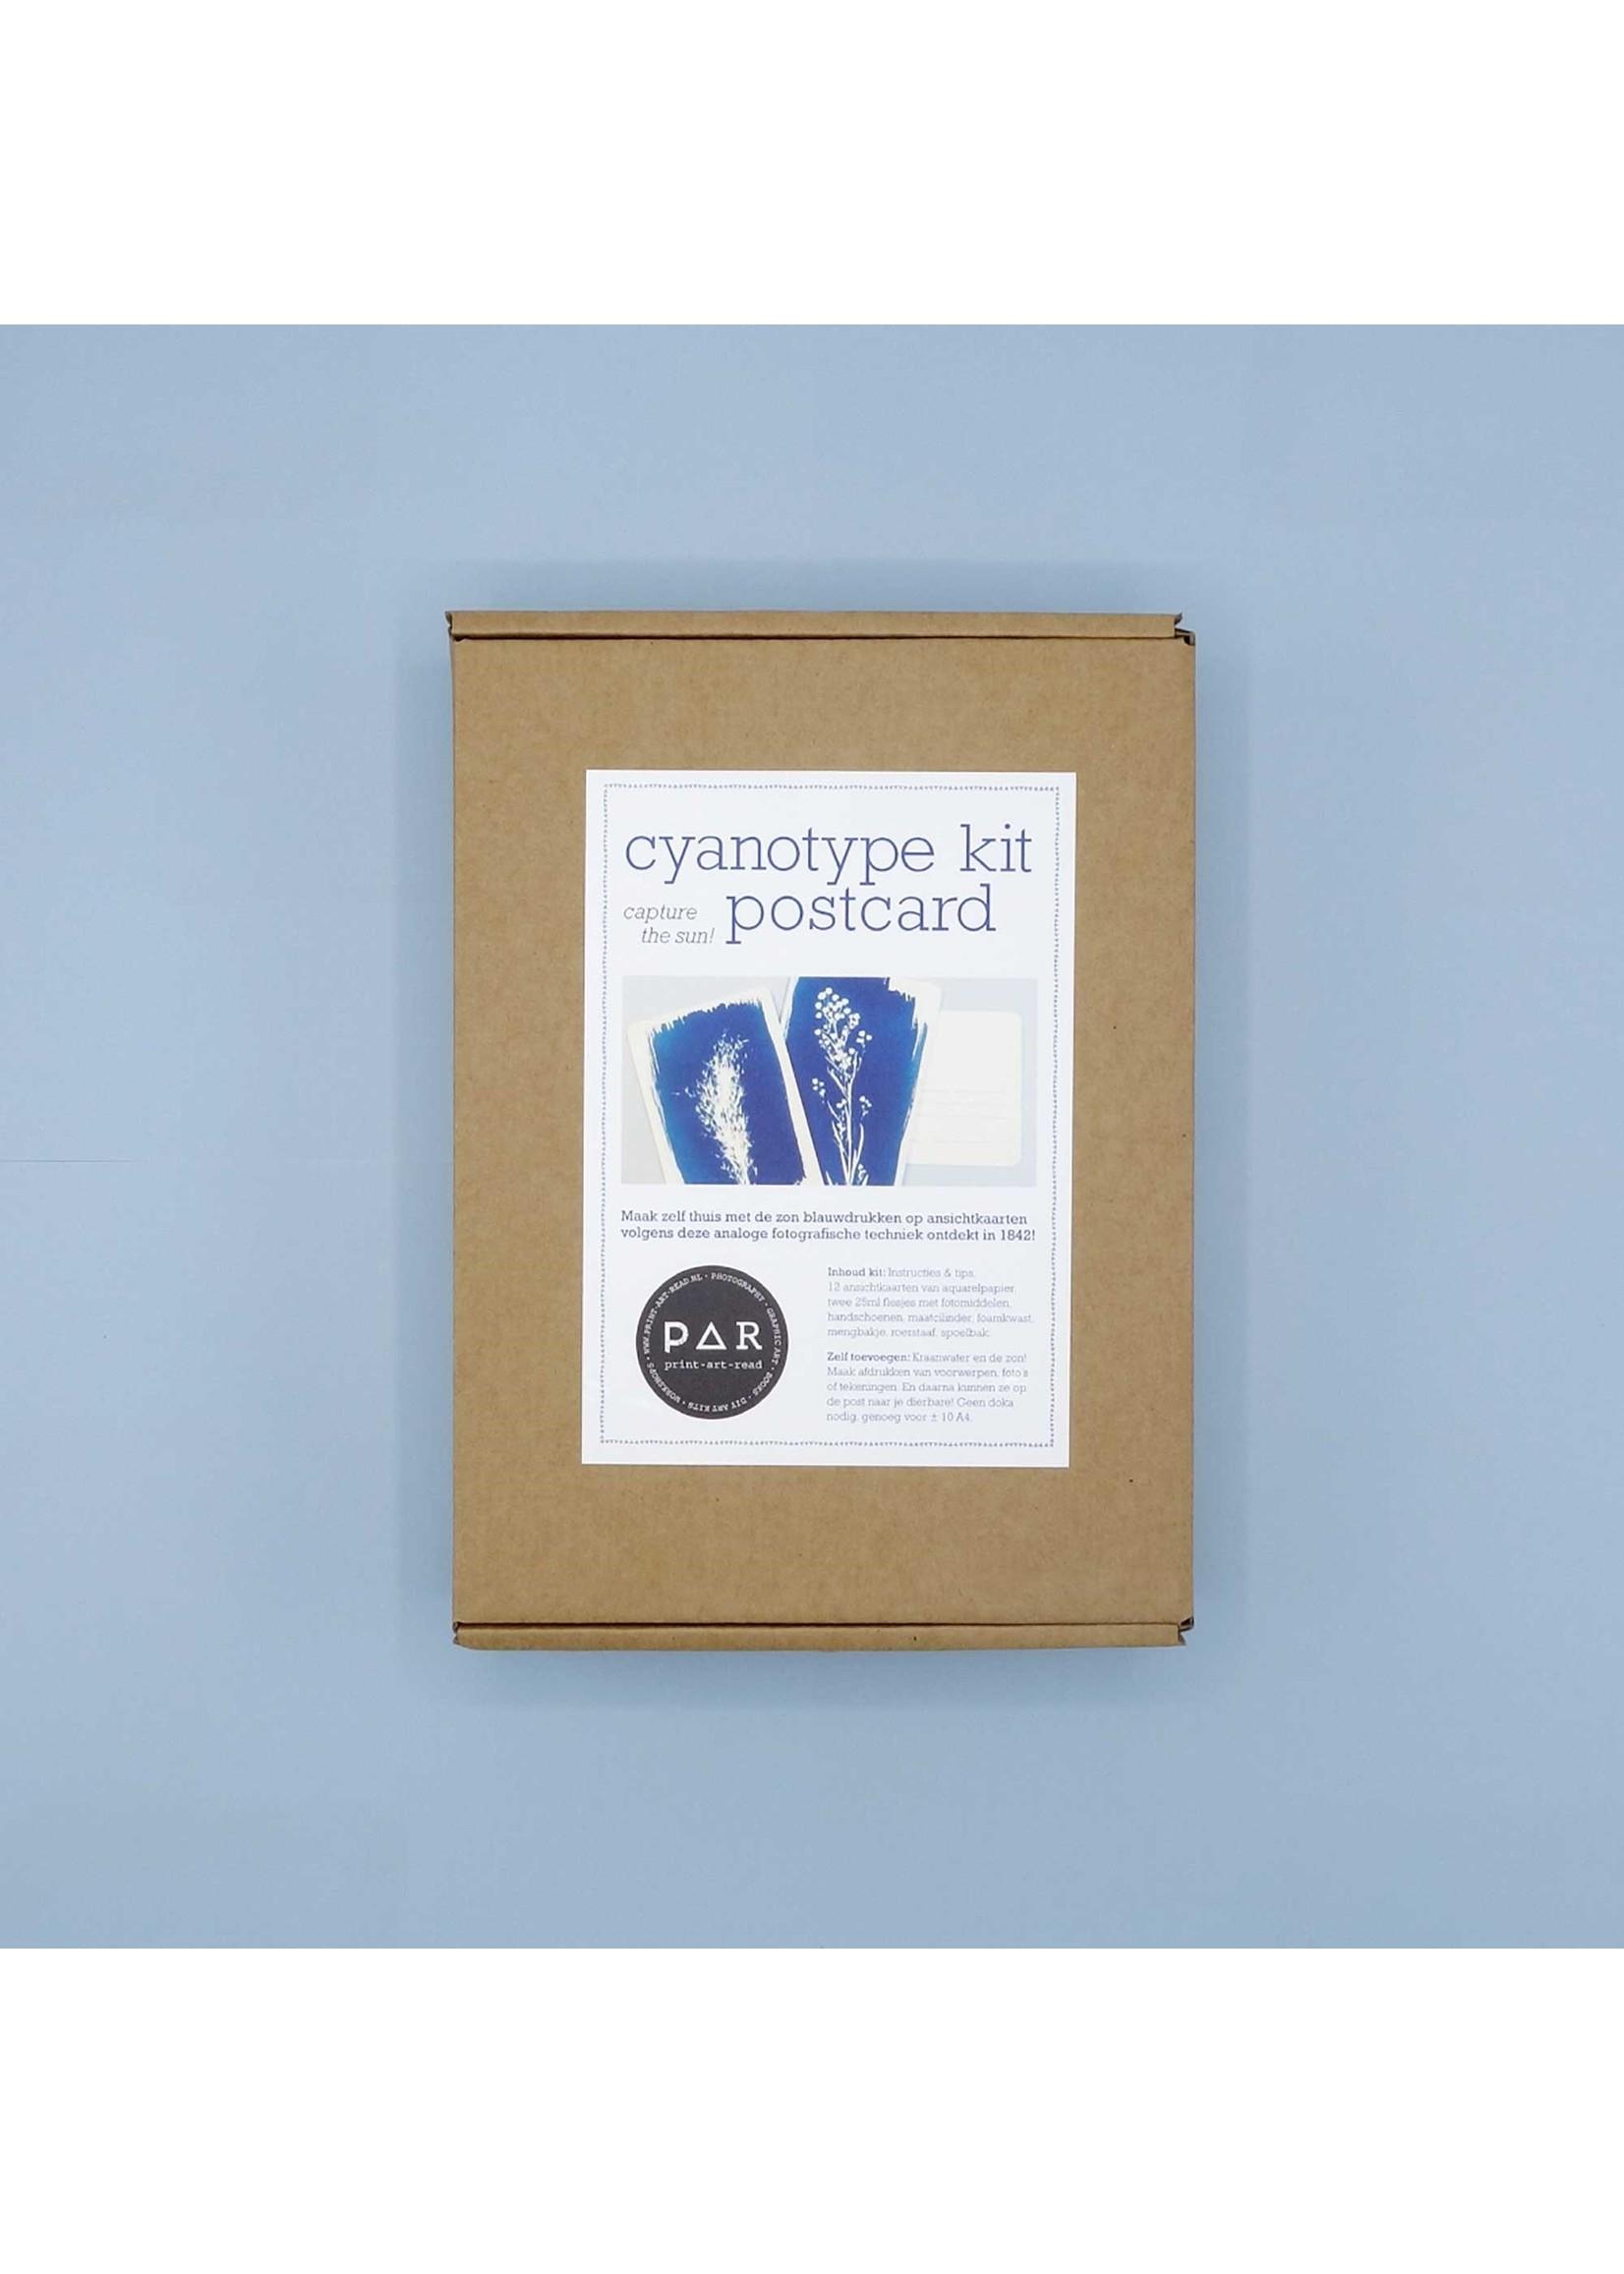 DIY kit make your own cyanotype print